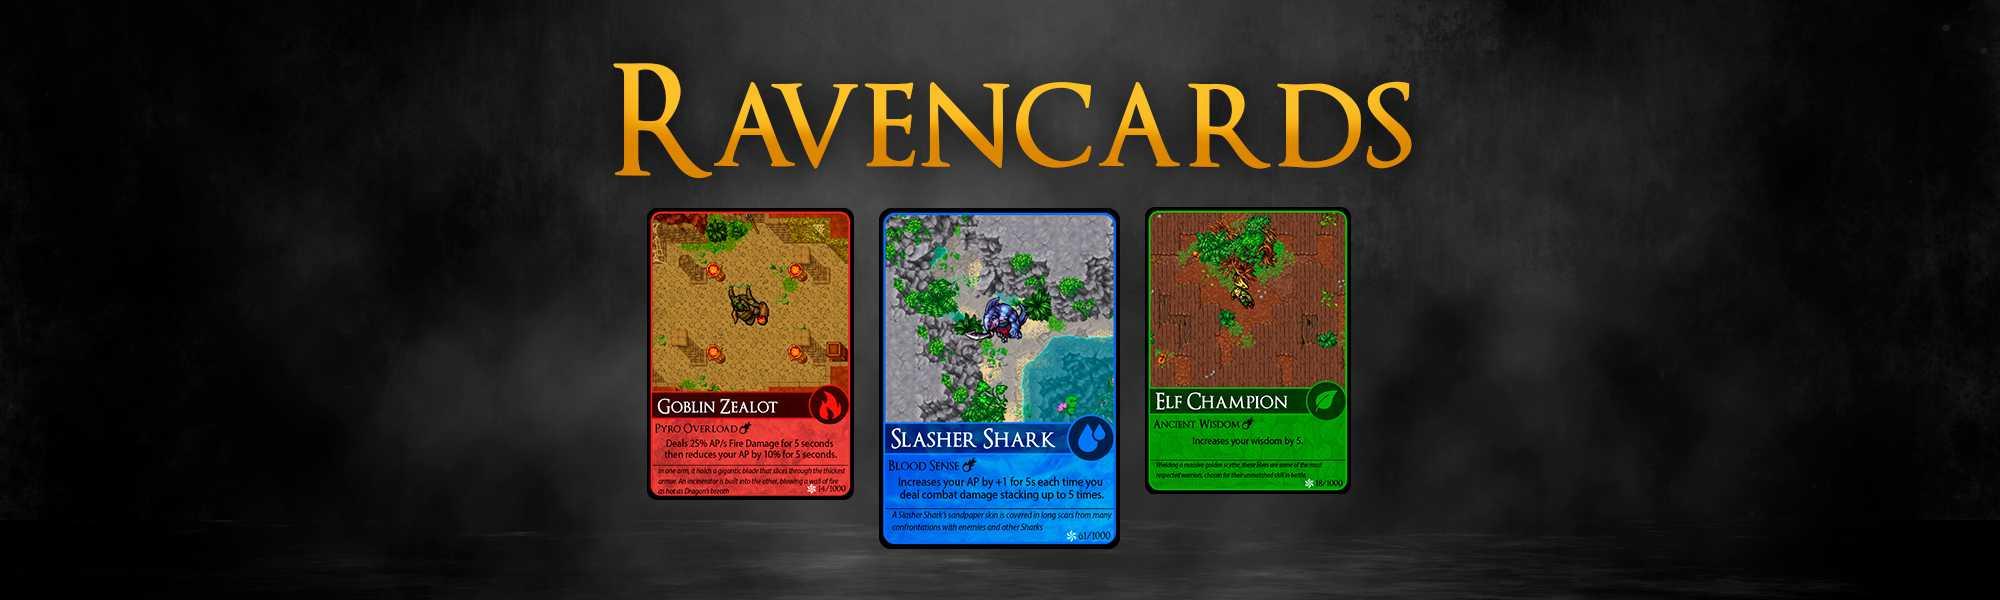 Dev Blog - Ravencards